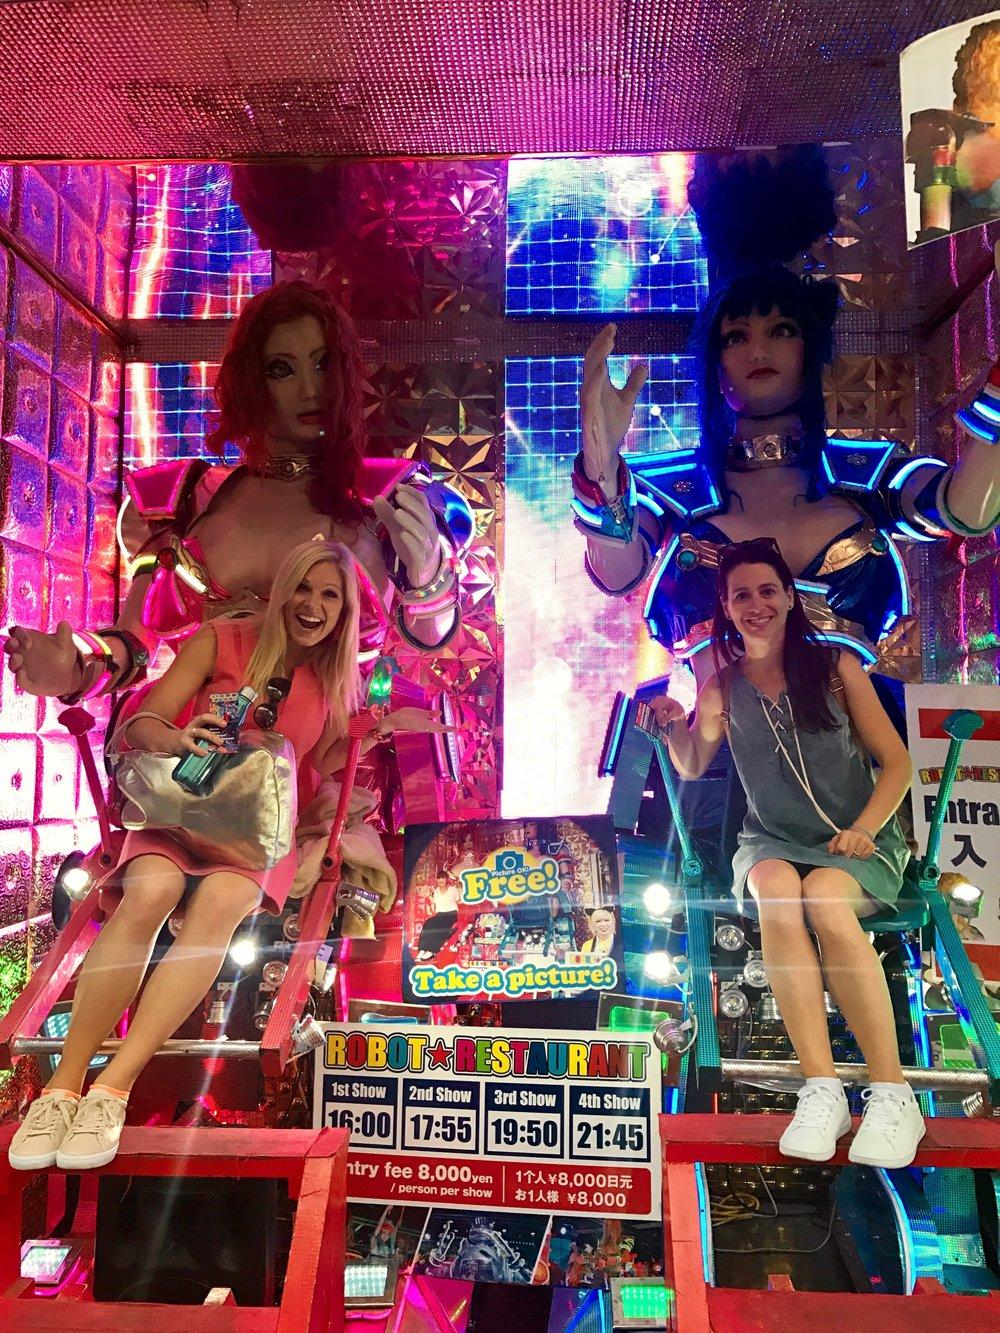 beijing seoul tokyo anna kooiman fitness travel lifestyle fashion asia adventure  robot show cabaret